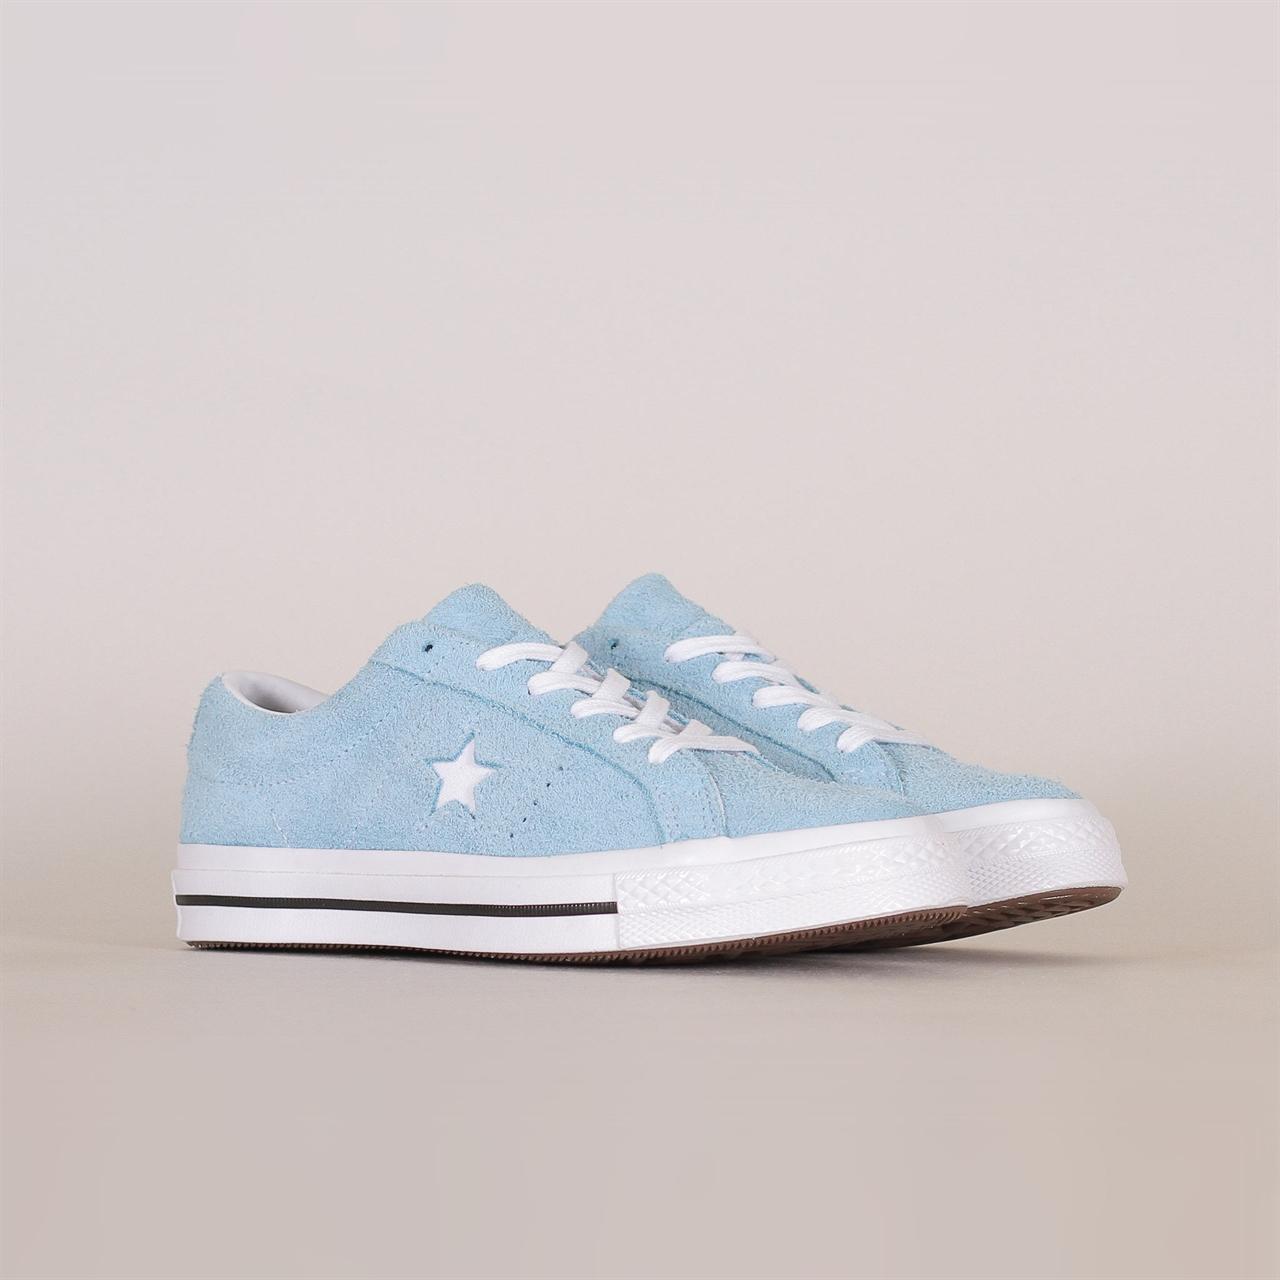 5471cf1b6641 One Star OX (161575C). 95EUR   a pair. Colorway  Shoreline Blue White